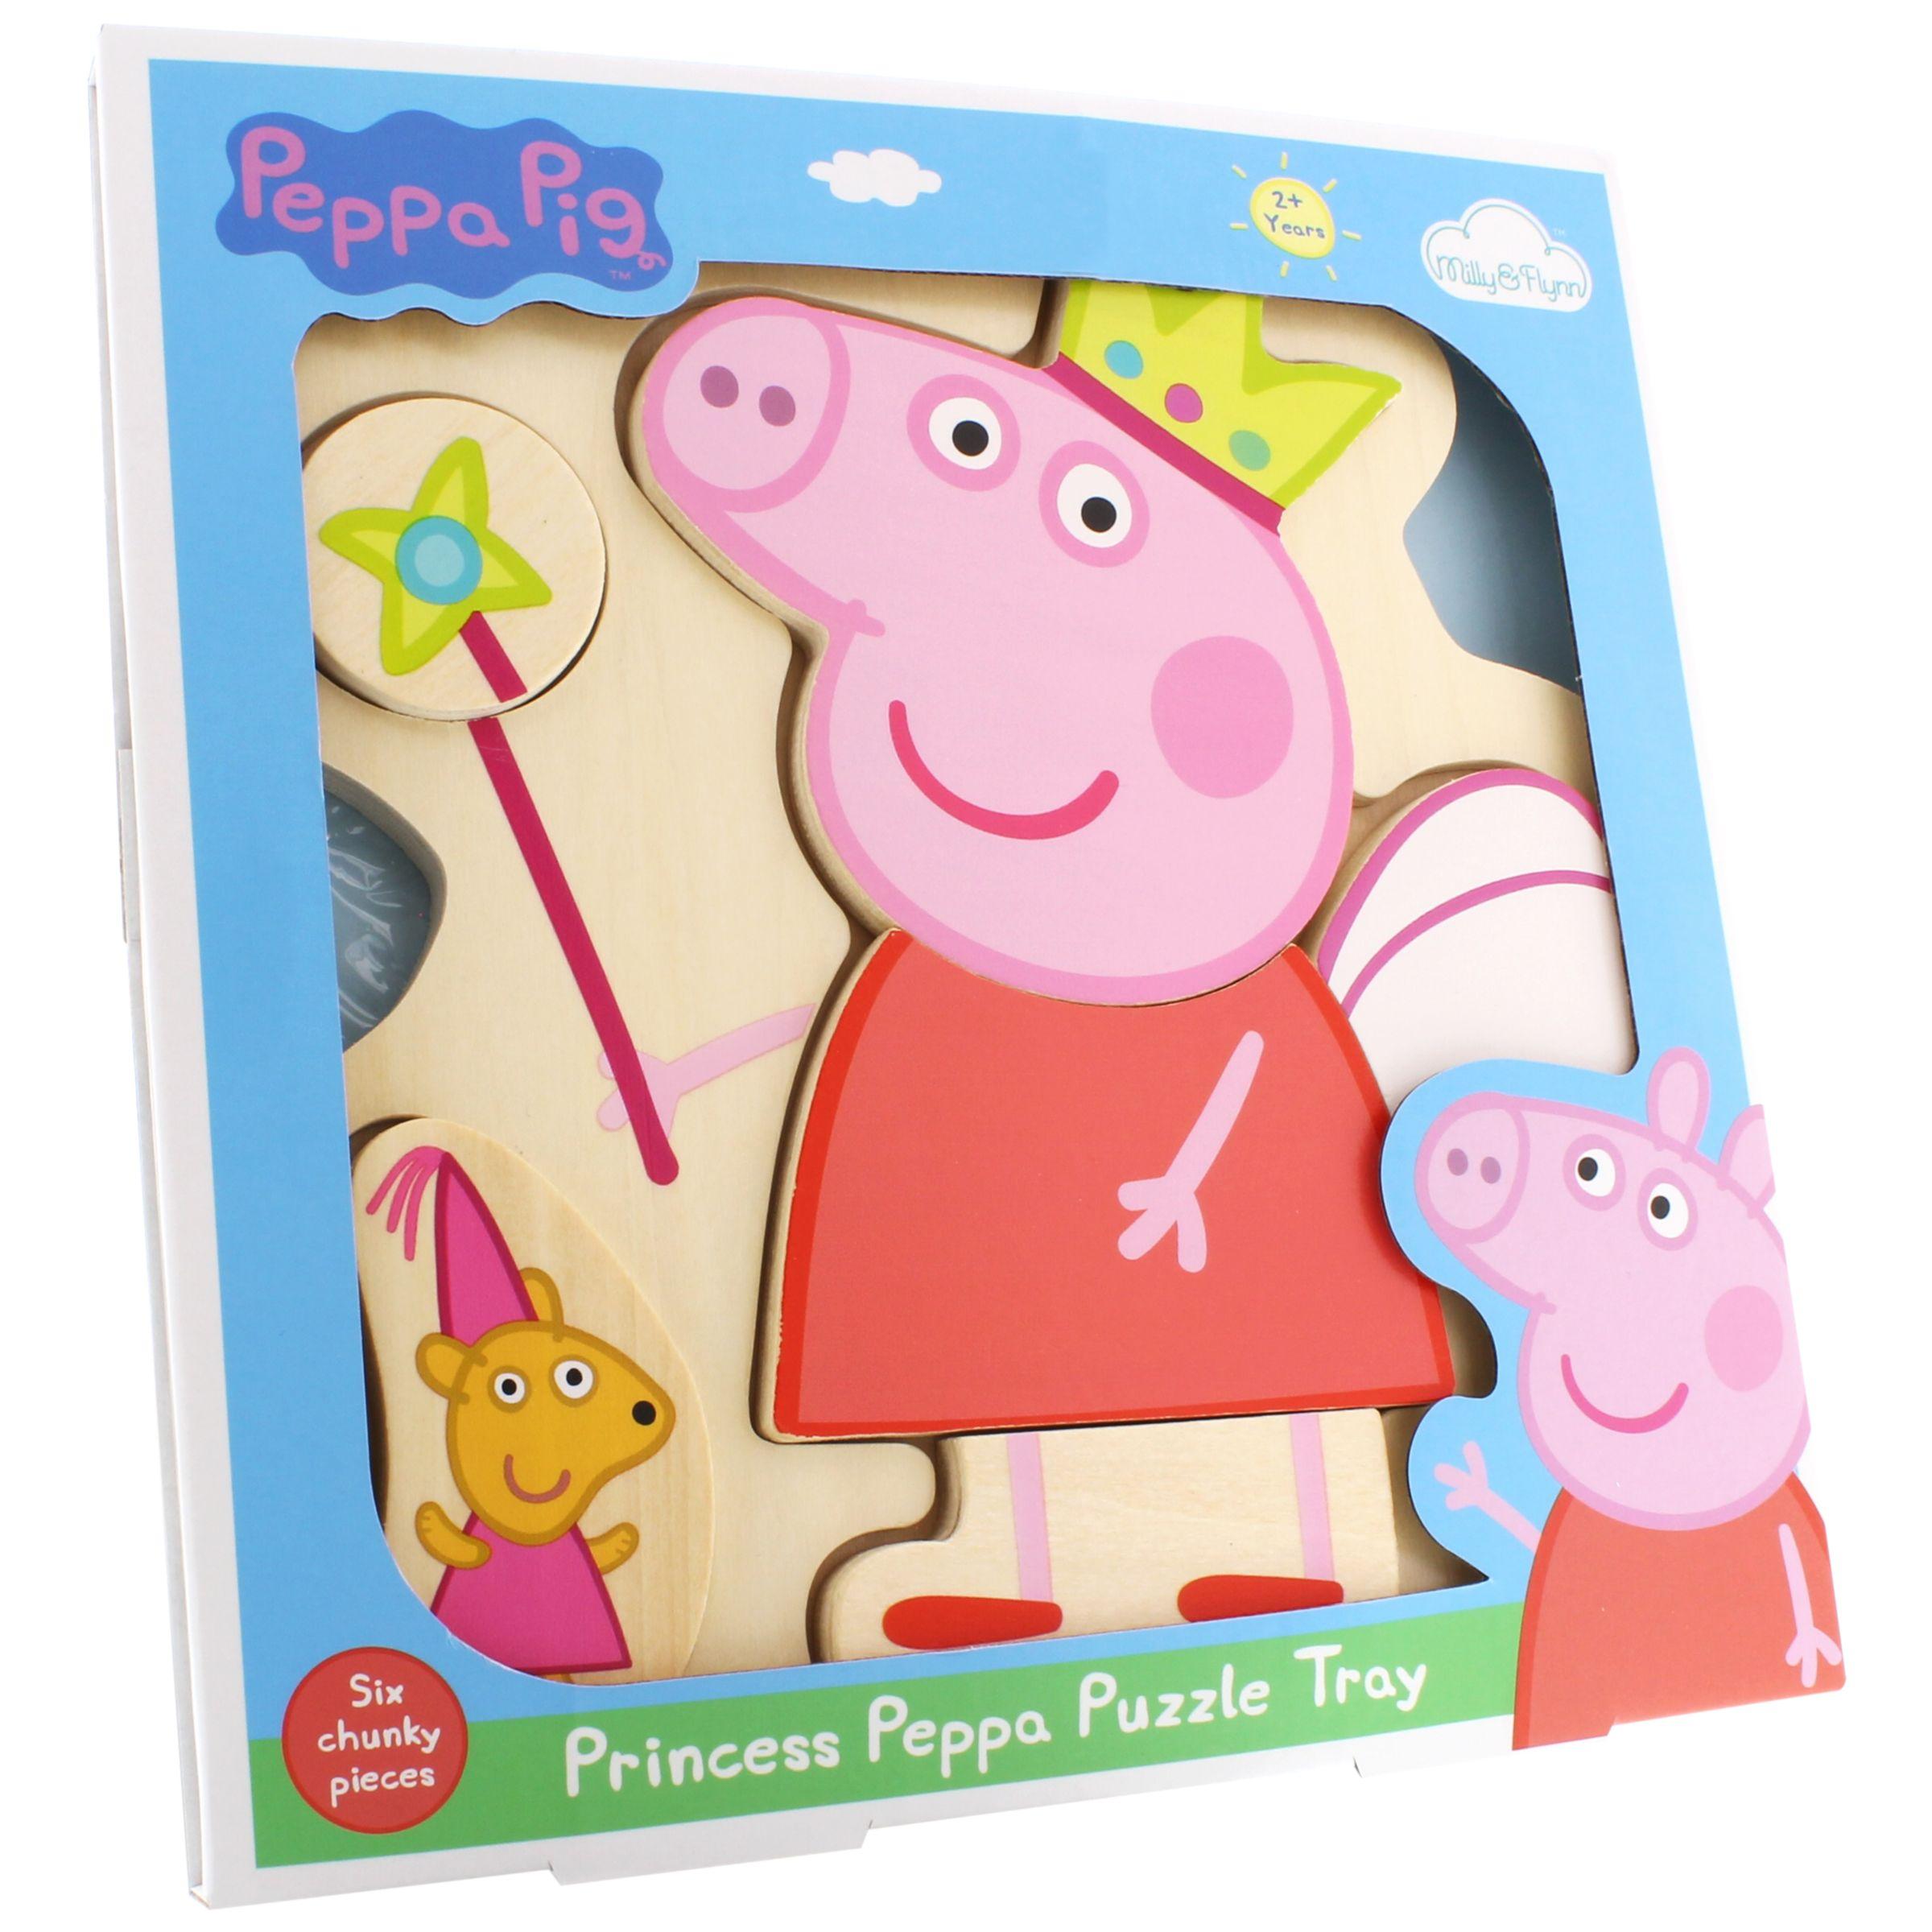 Princess Peppa Wooden Puzzle Tray